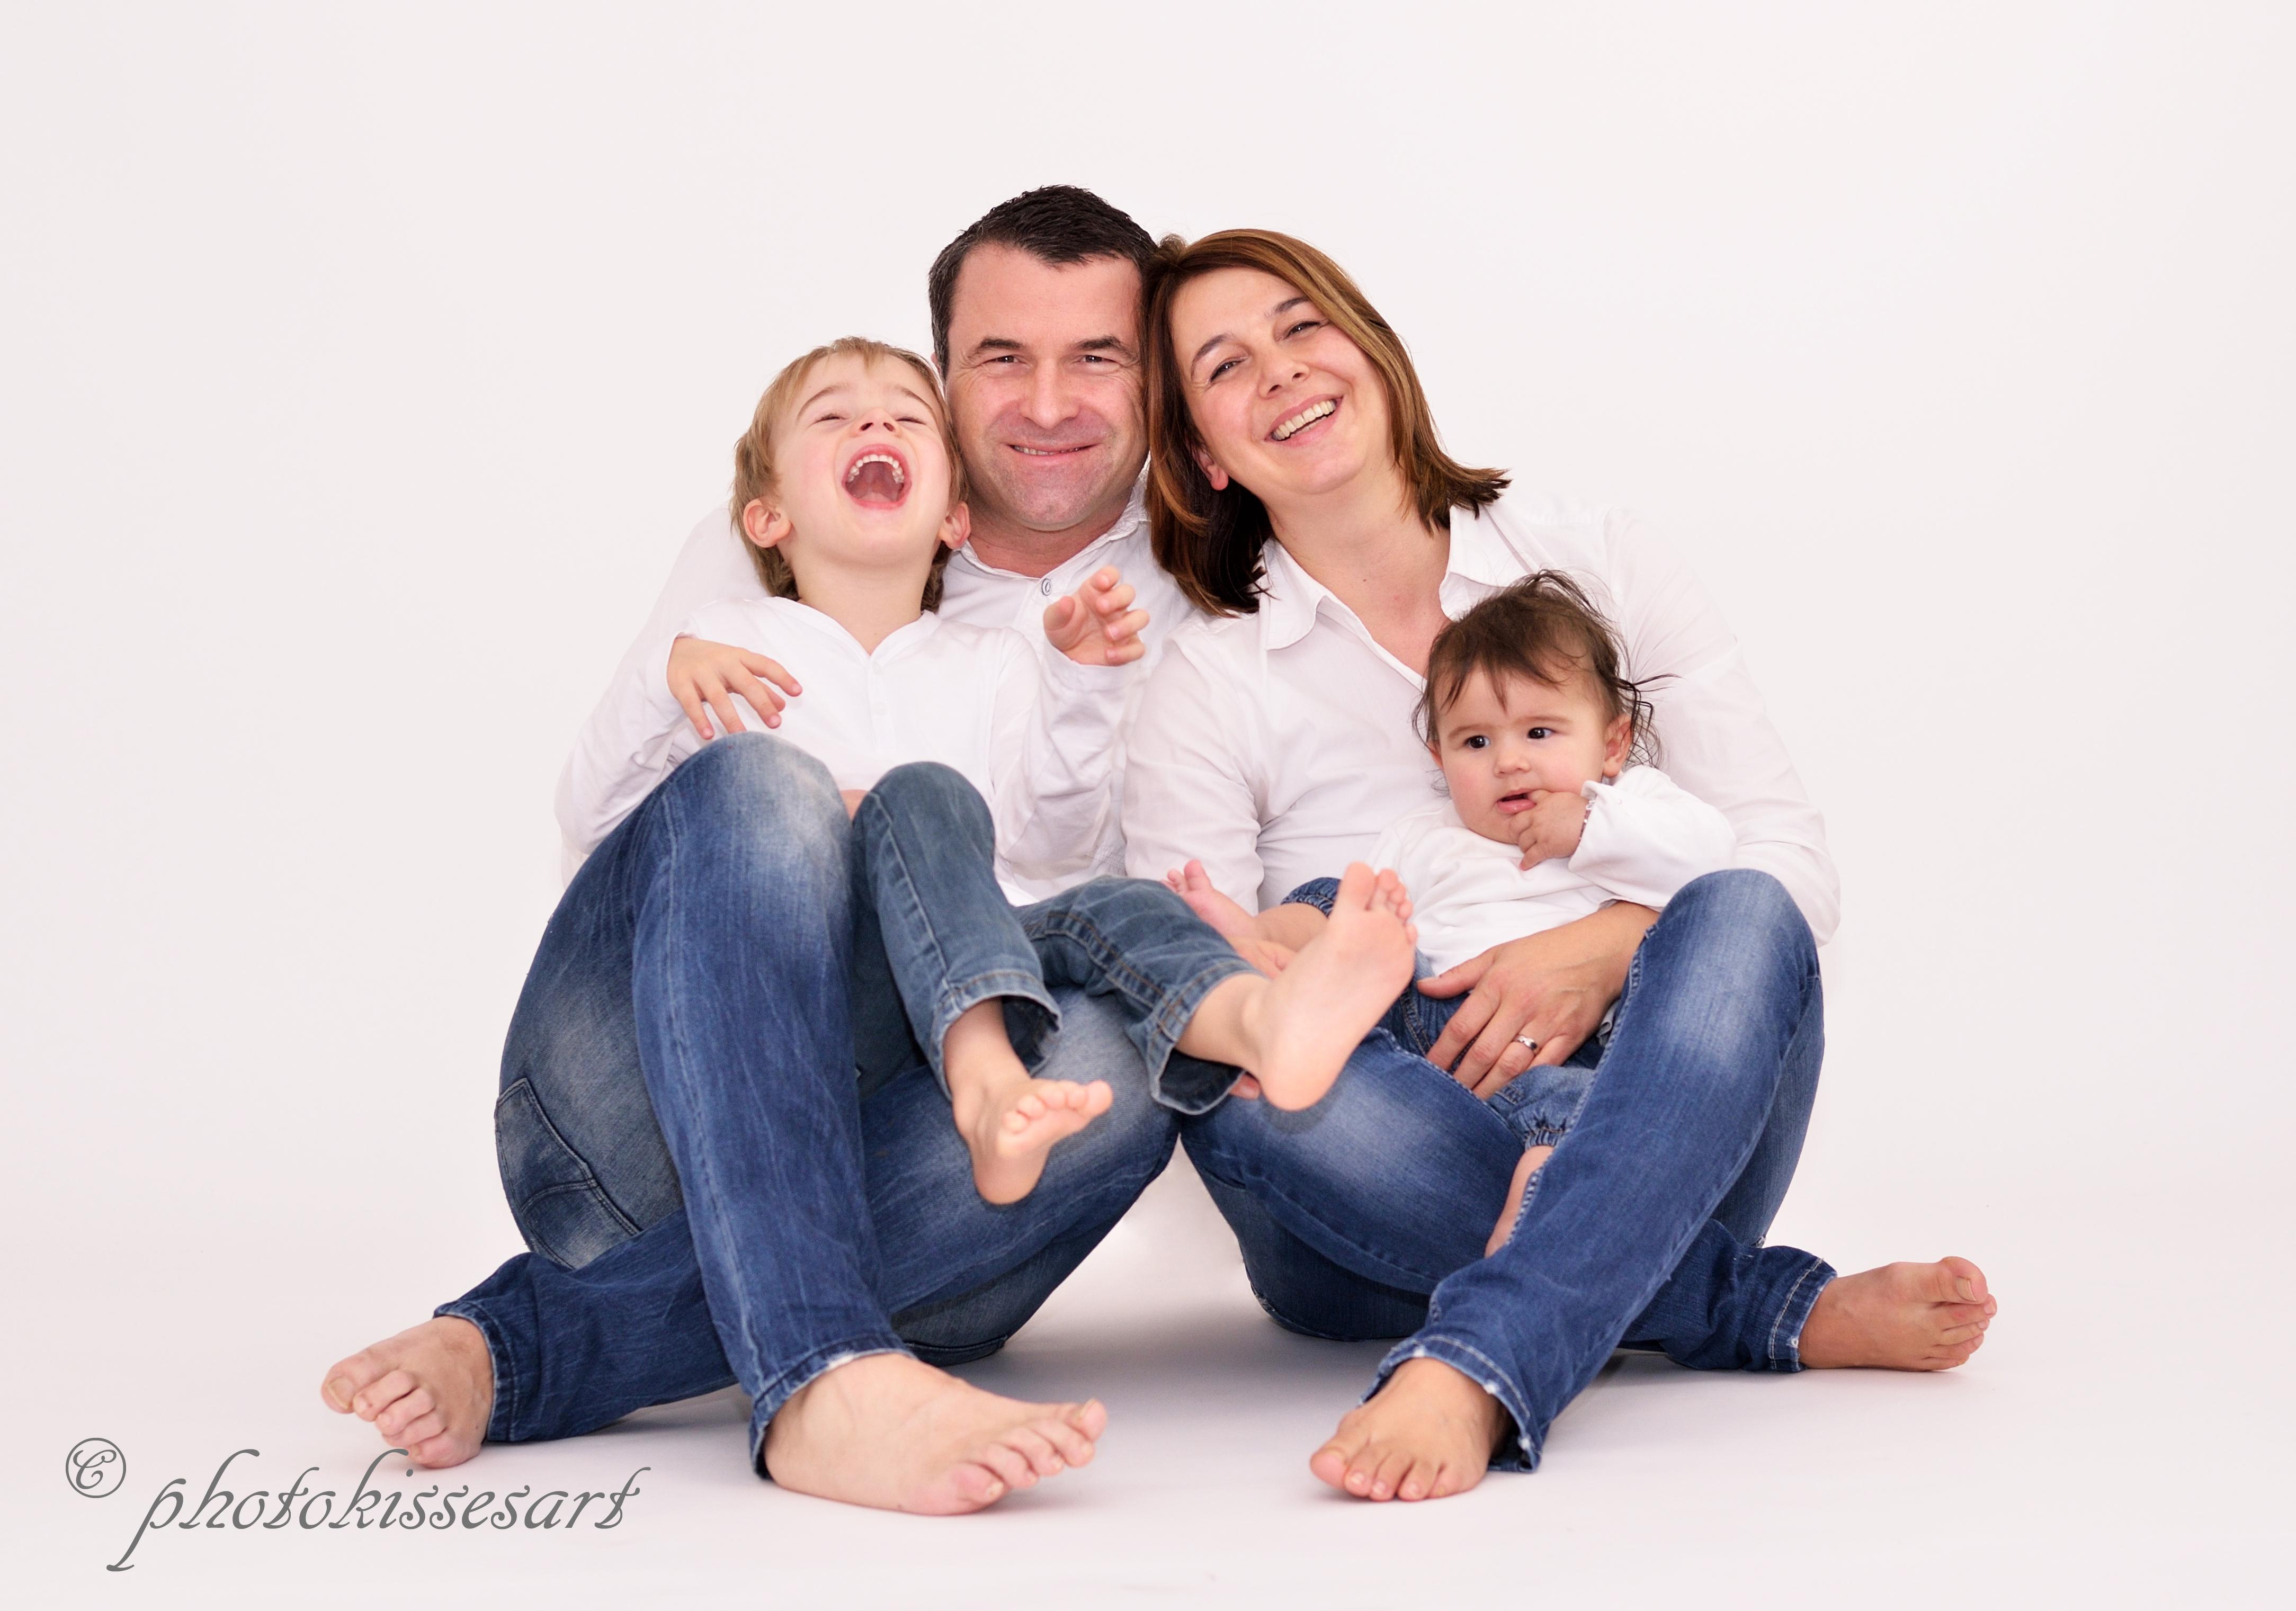 Familienfotos Langenfeld photokissesart Mueller (5).jpg